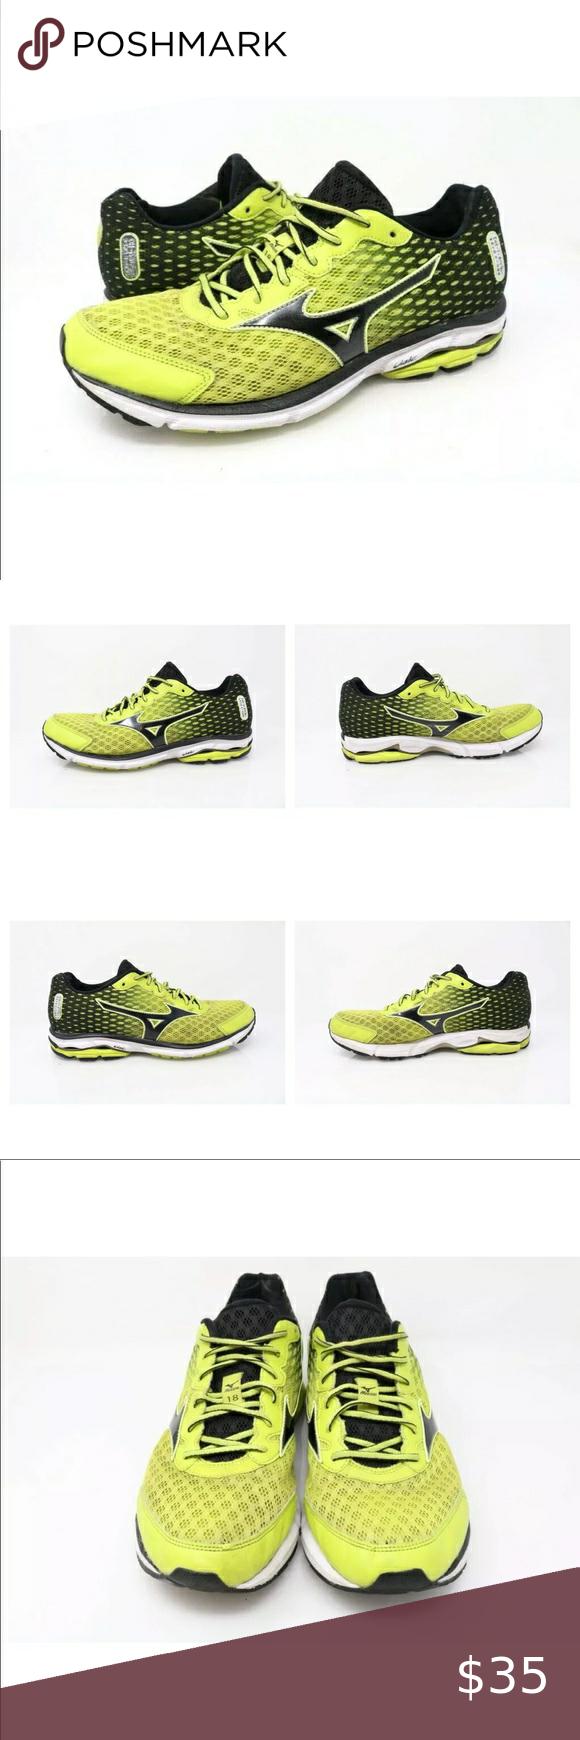 mizuno 18 running shoes